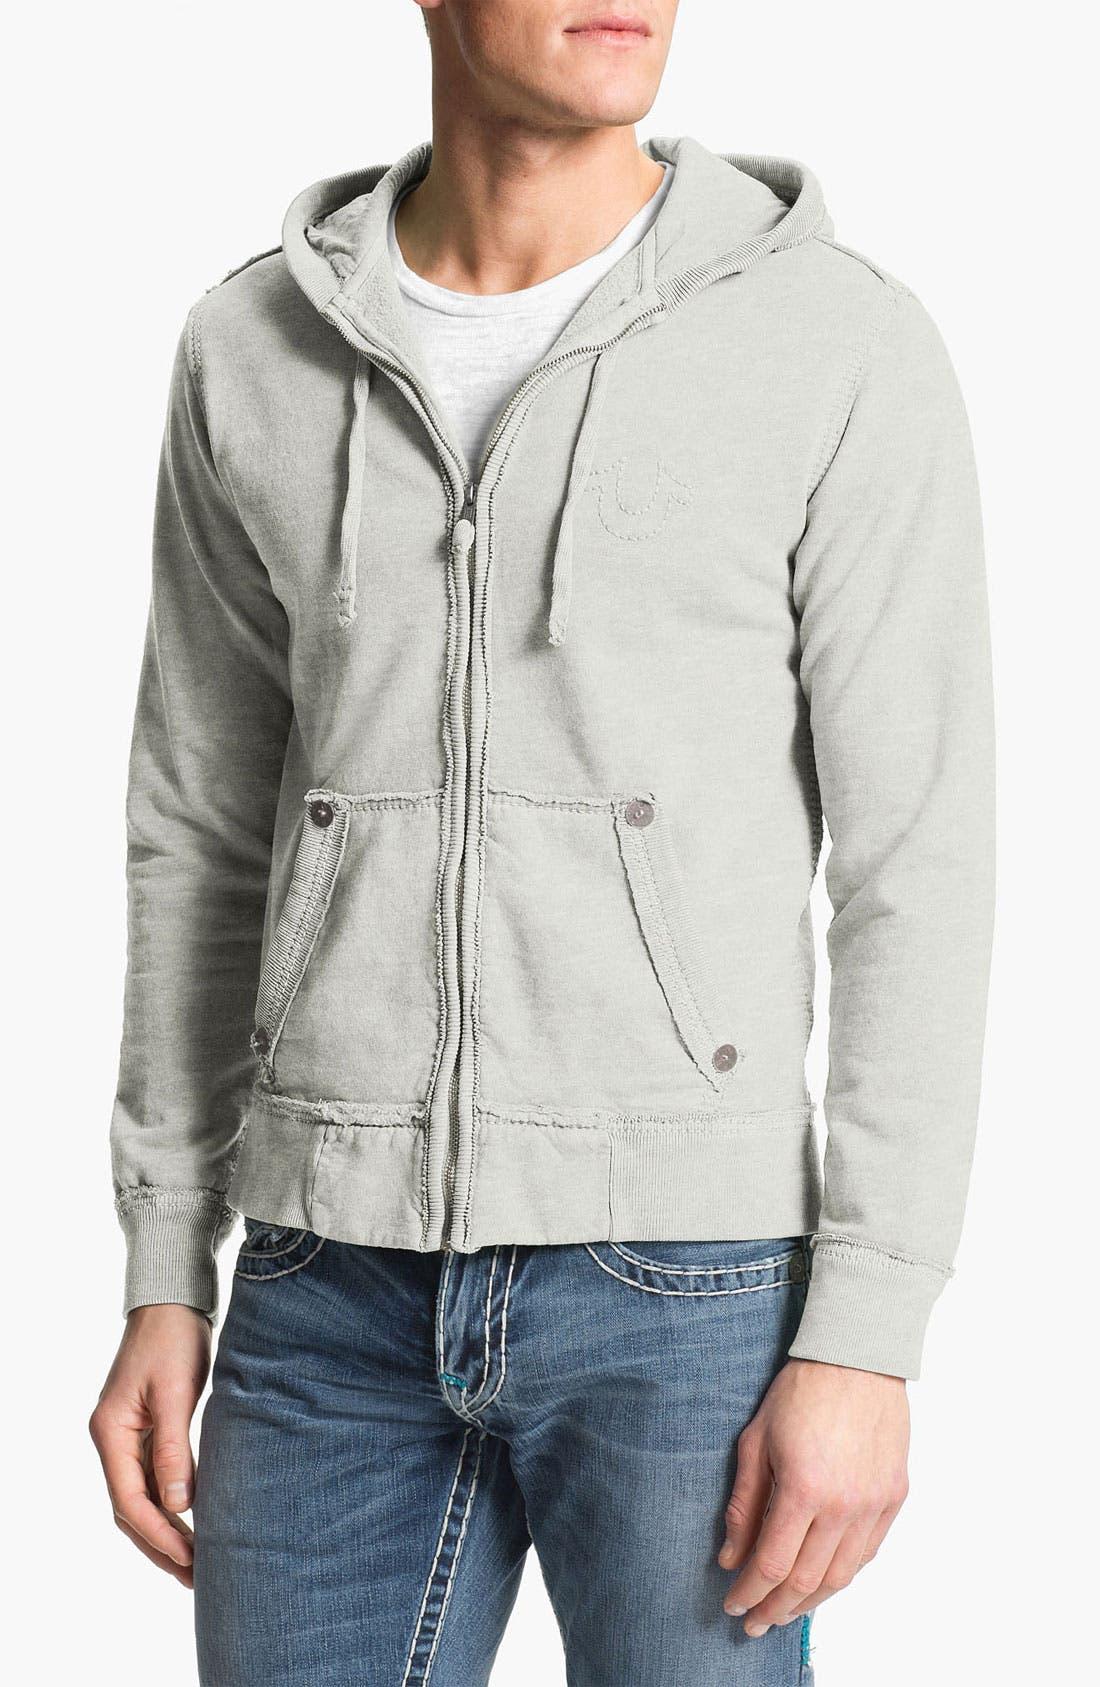 Main Image - True Religion Brand Jeans 'Big T' Zip Hoodie